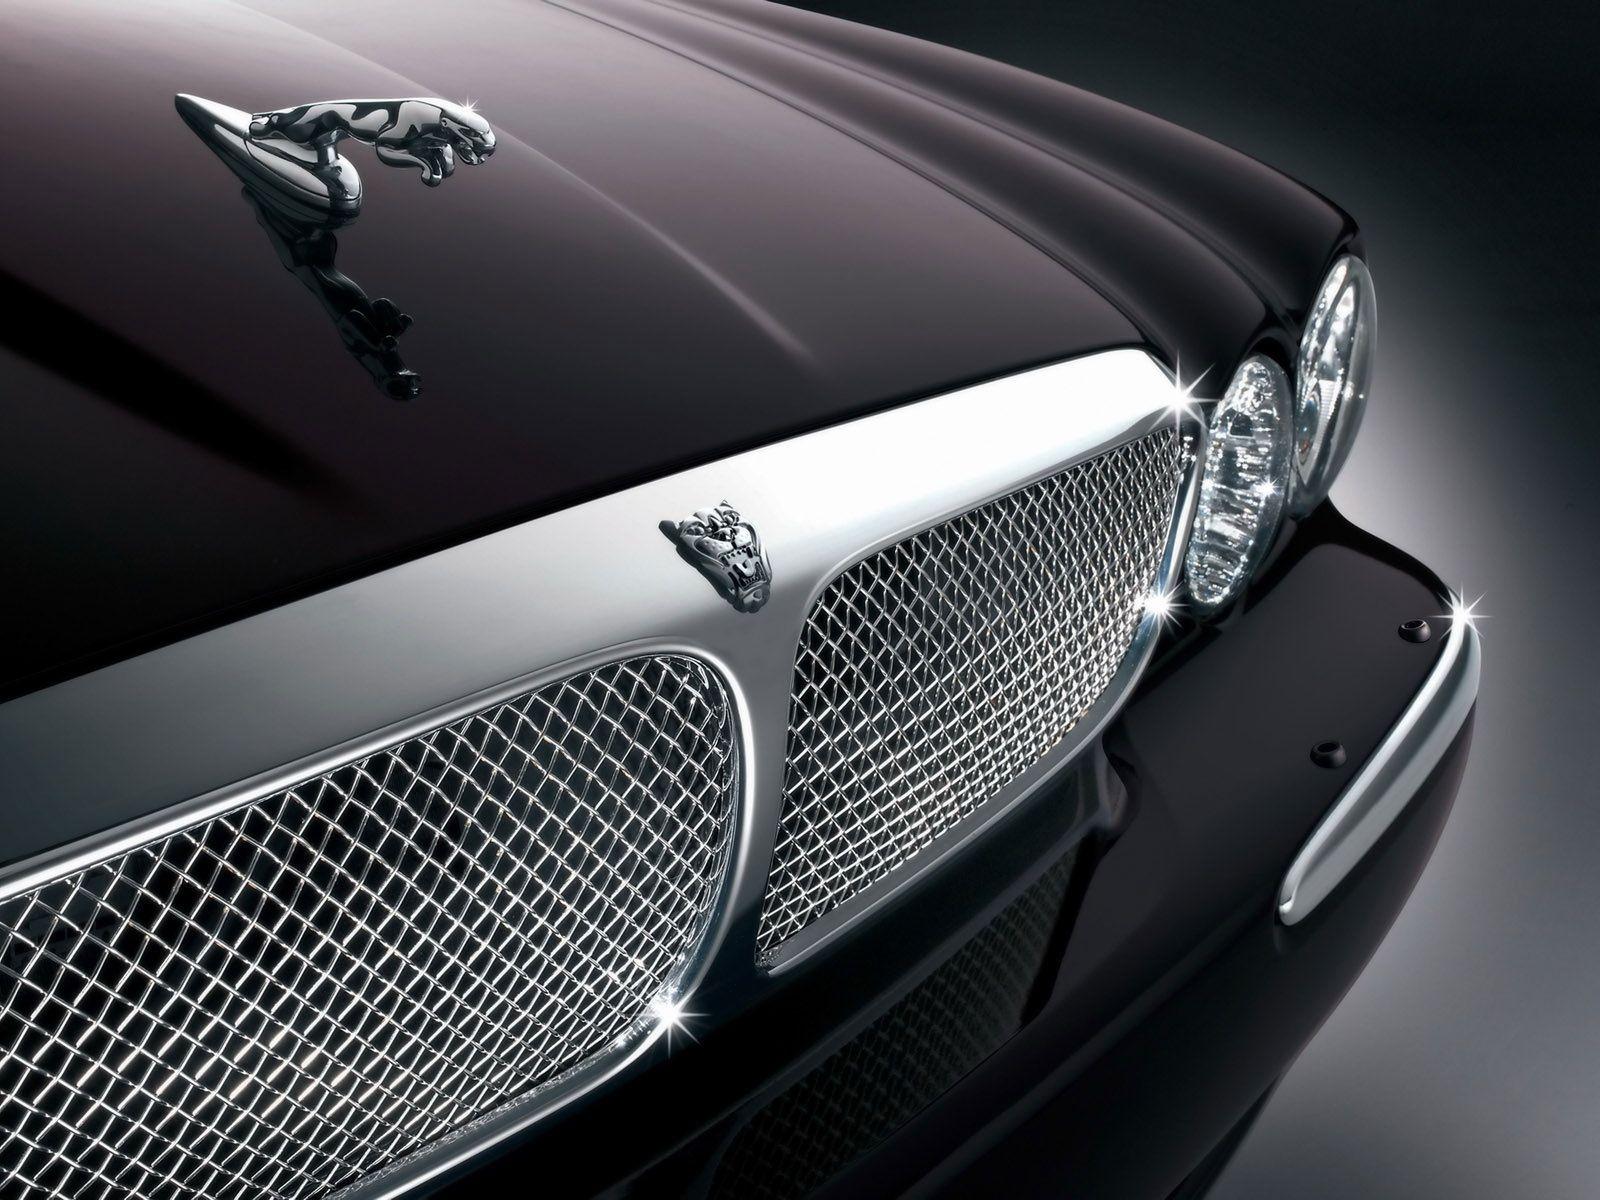 Wallpaper download jaguar - Amazing Jaguar Logo Cars Wallpaper Picture Image Free Download